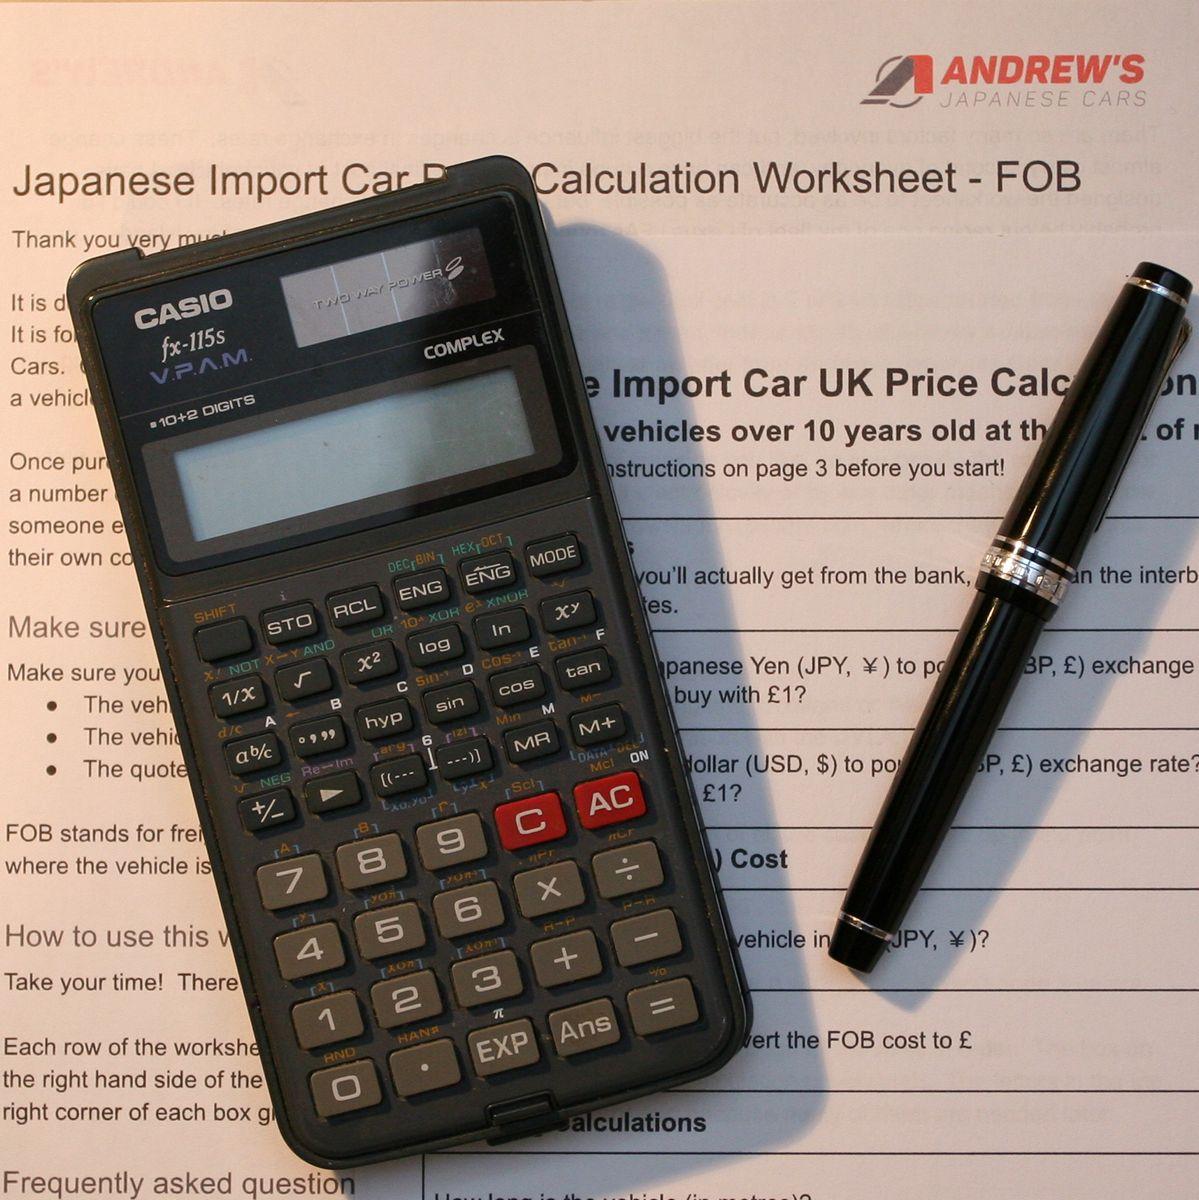 Japanese Import Car Uk Price Calculation Worksheet